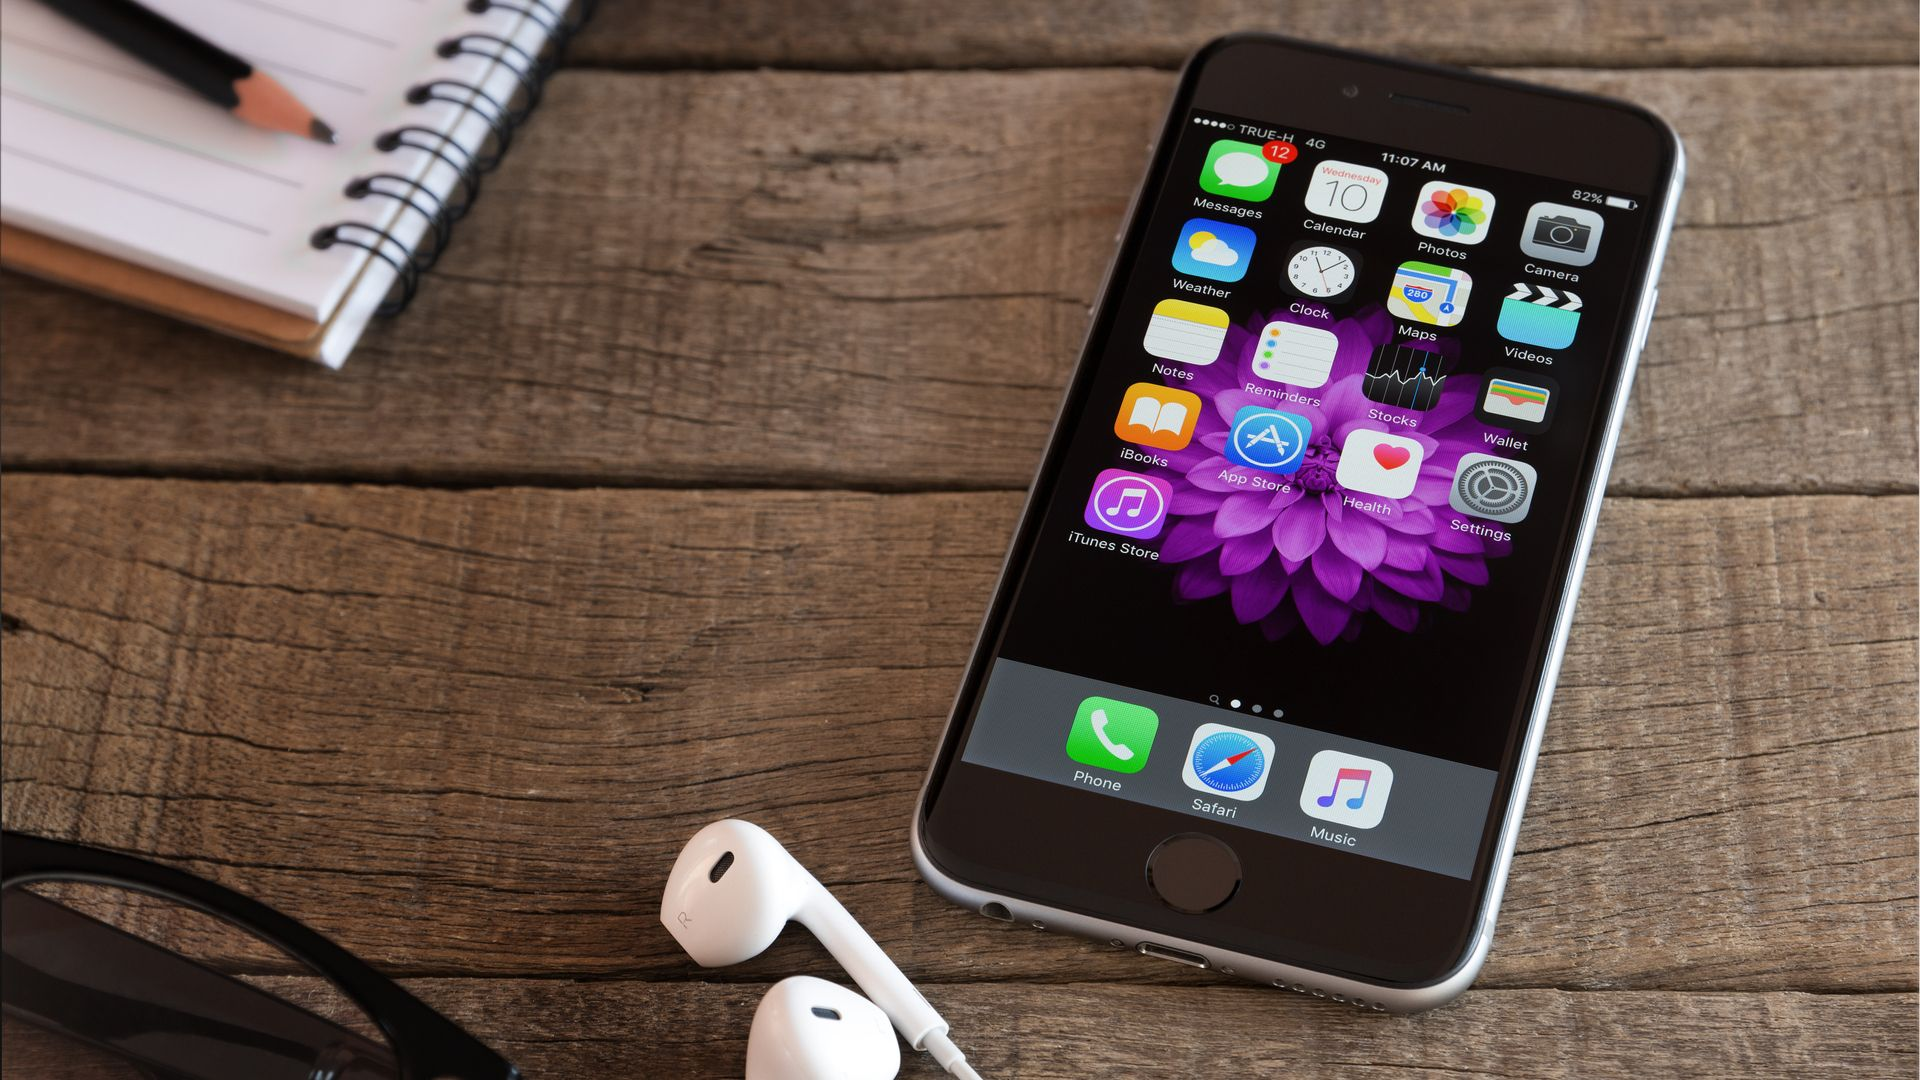 iPhone 6 tem processador de 2014. (Imagem: blackzheep/Shutterstock)